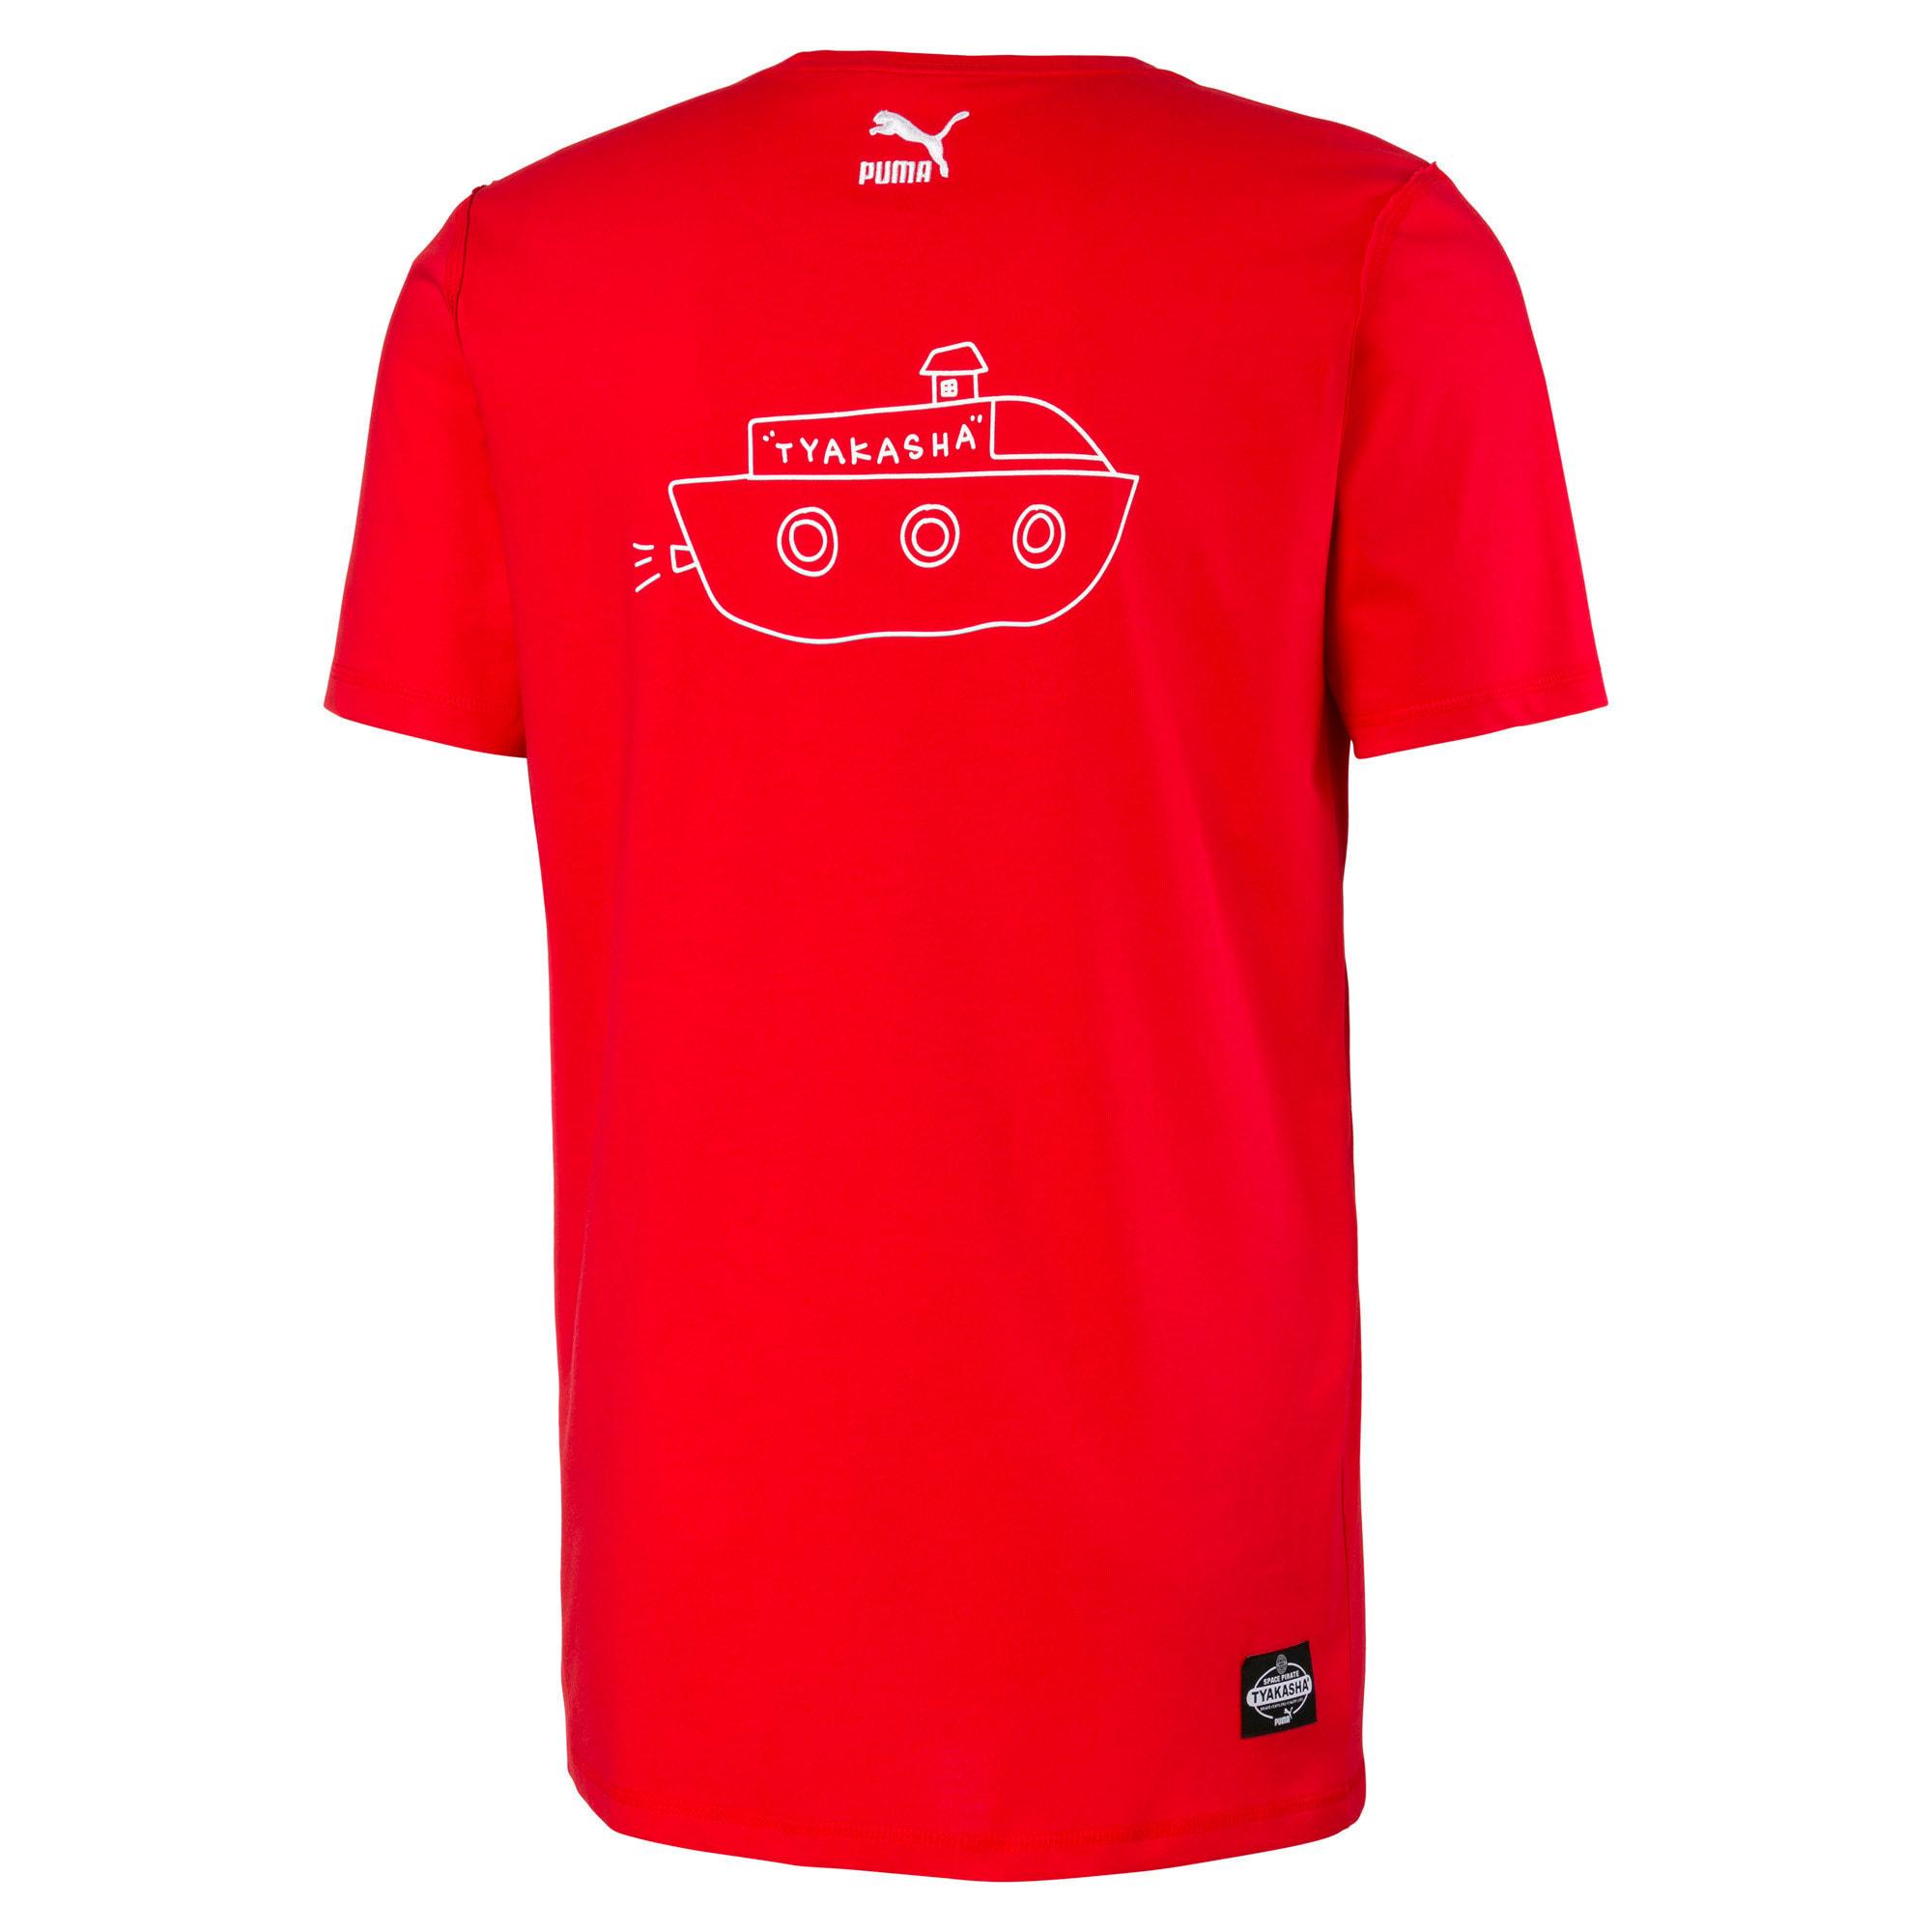 Miniatura 5 de Camiseta PUMA x TYAKASHA , High Risk Red, mediano